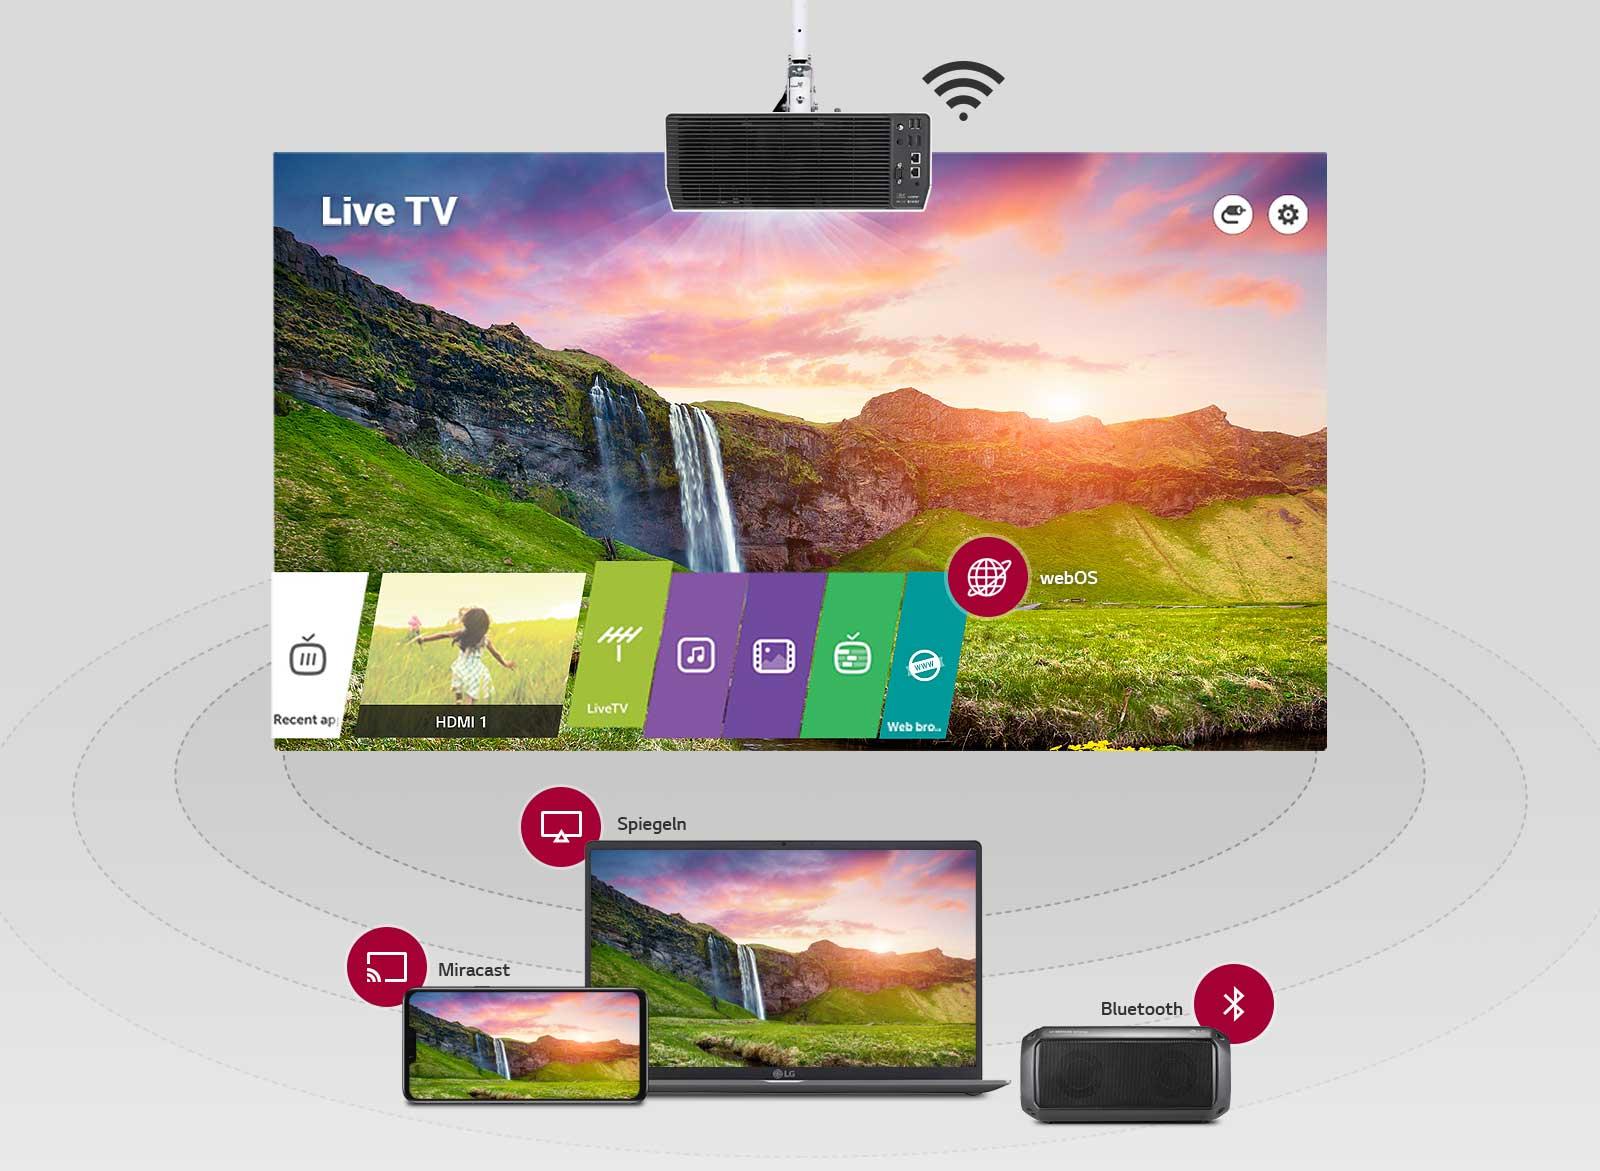 LiveTV webOS Neueste App HDMI 1 LiveTV Web-Bro Spiegeln Miracast Bluetooth